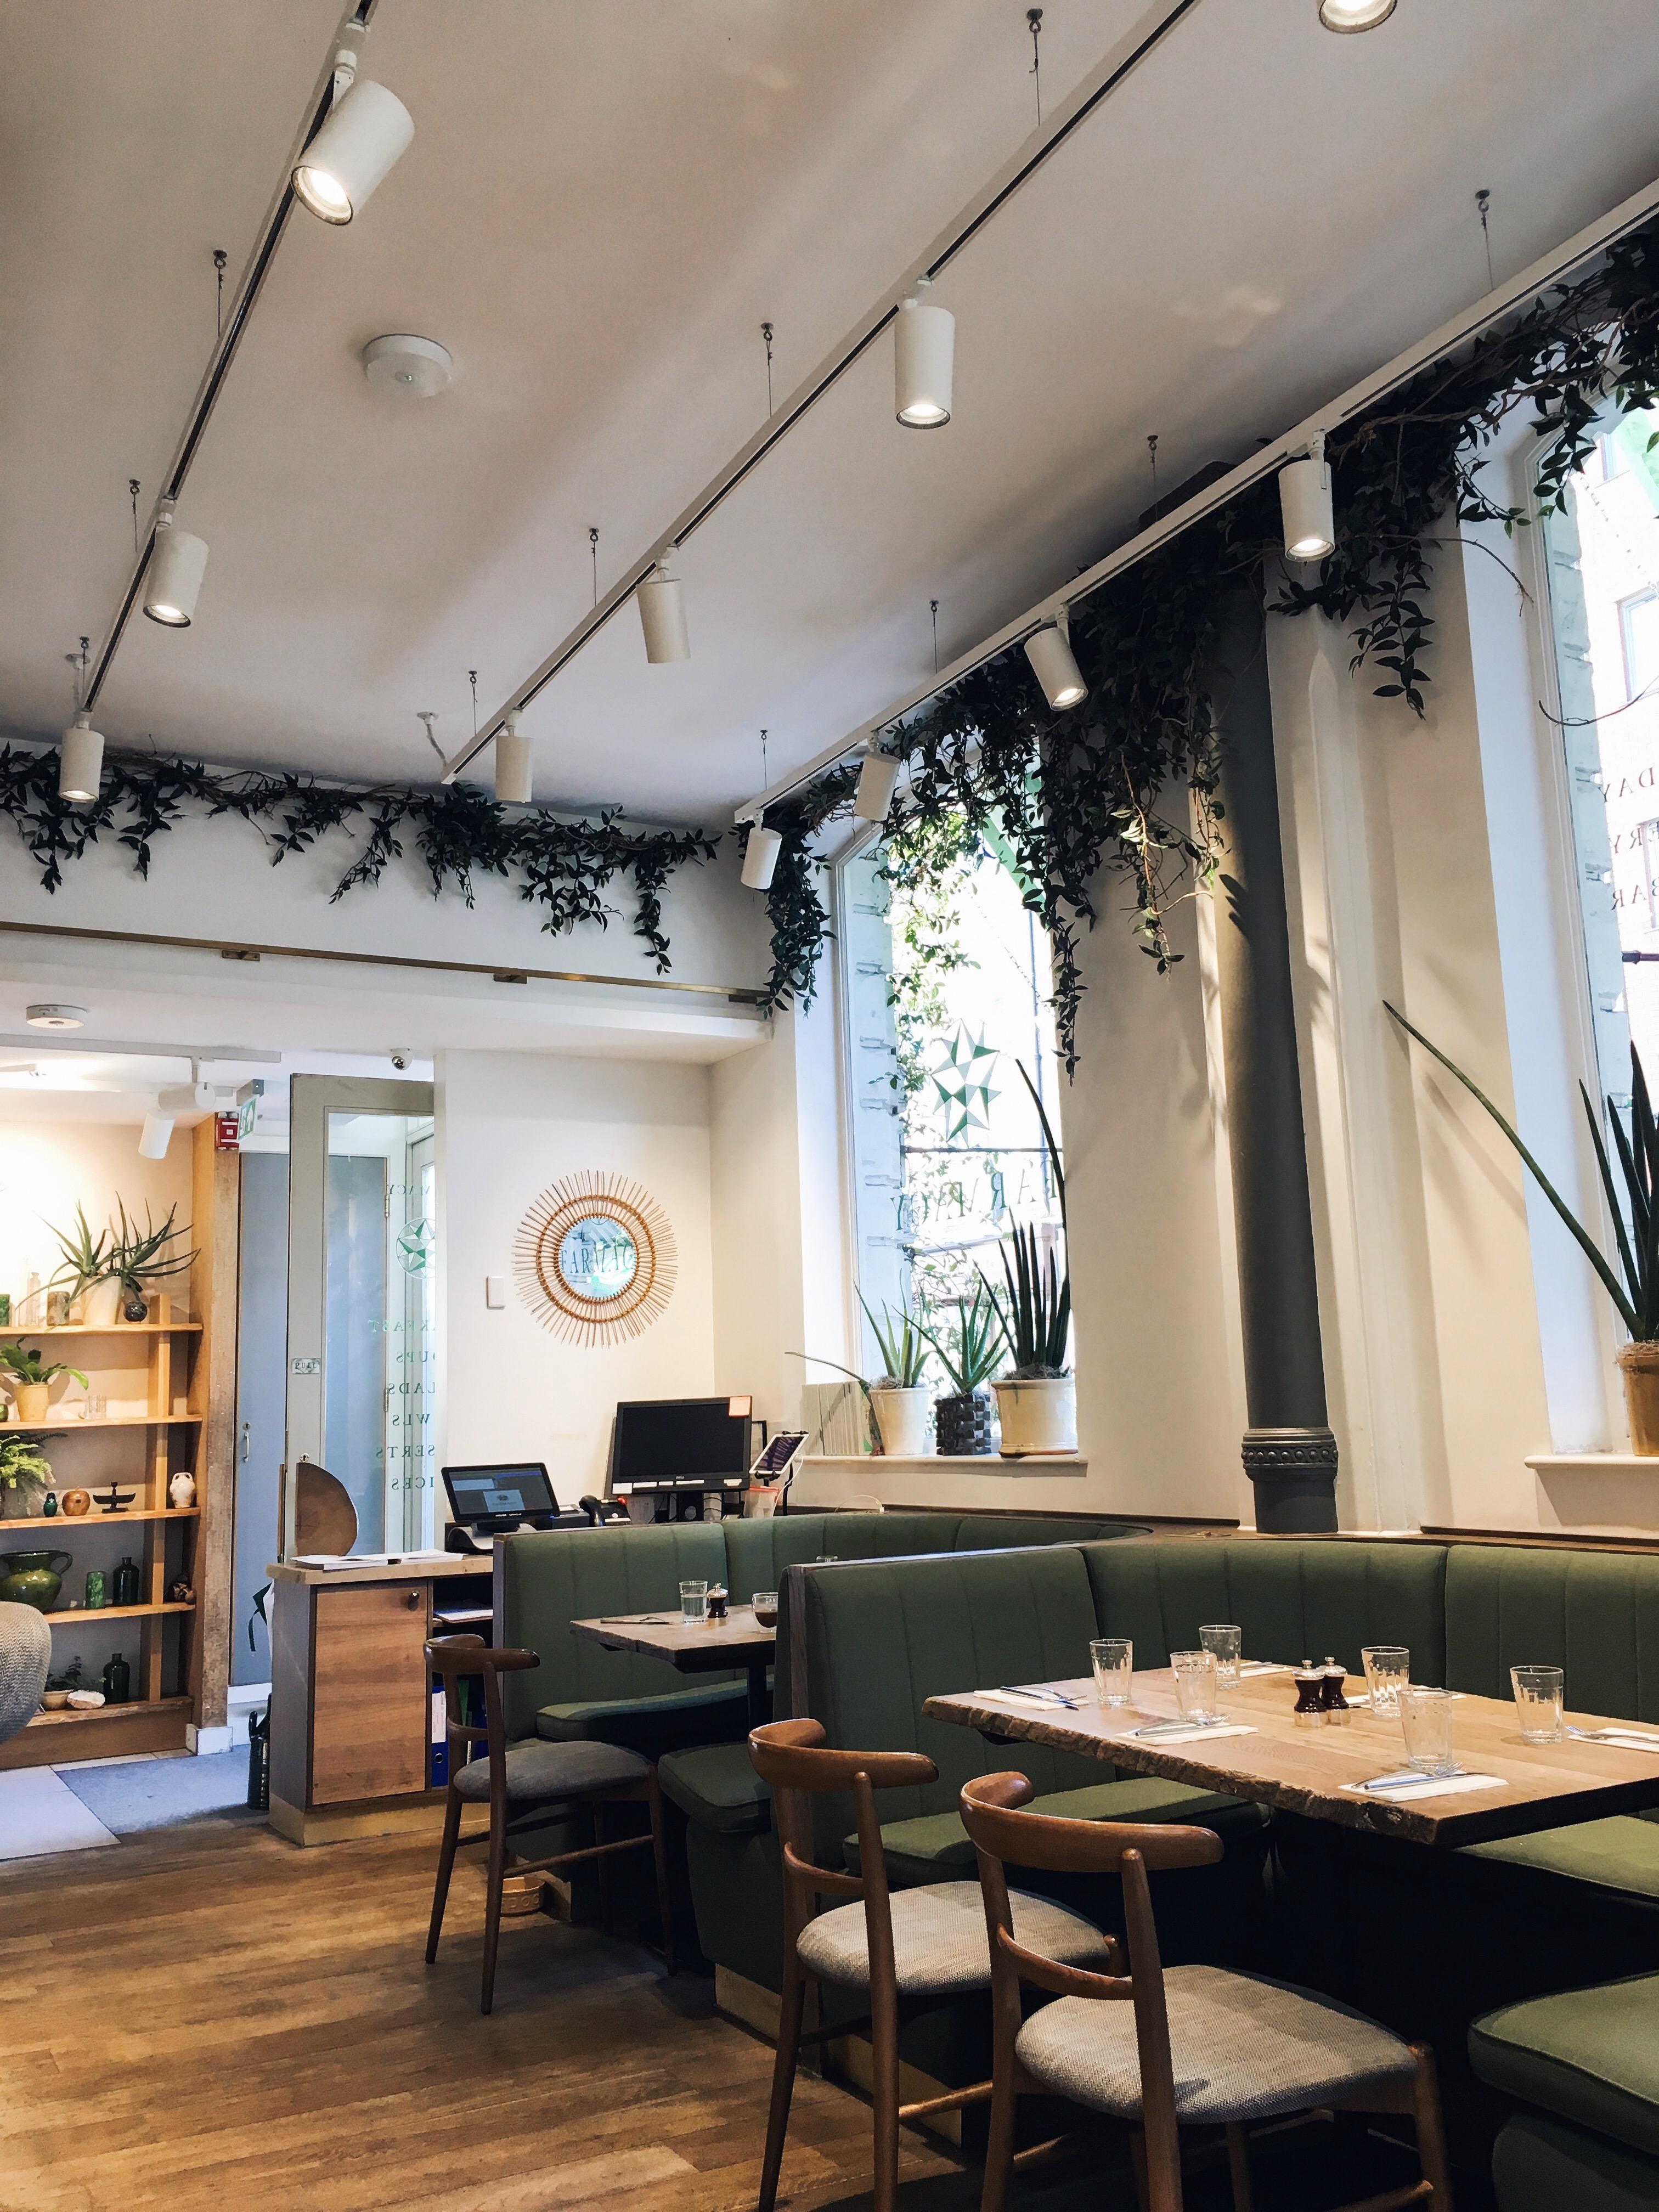 Die 10 besten Cafés in London